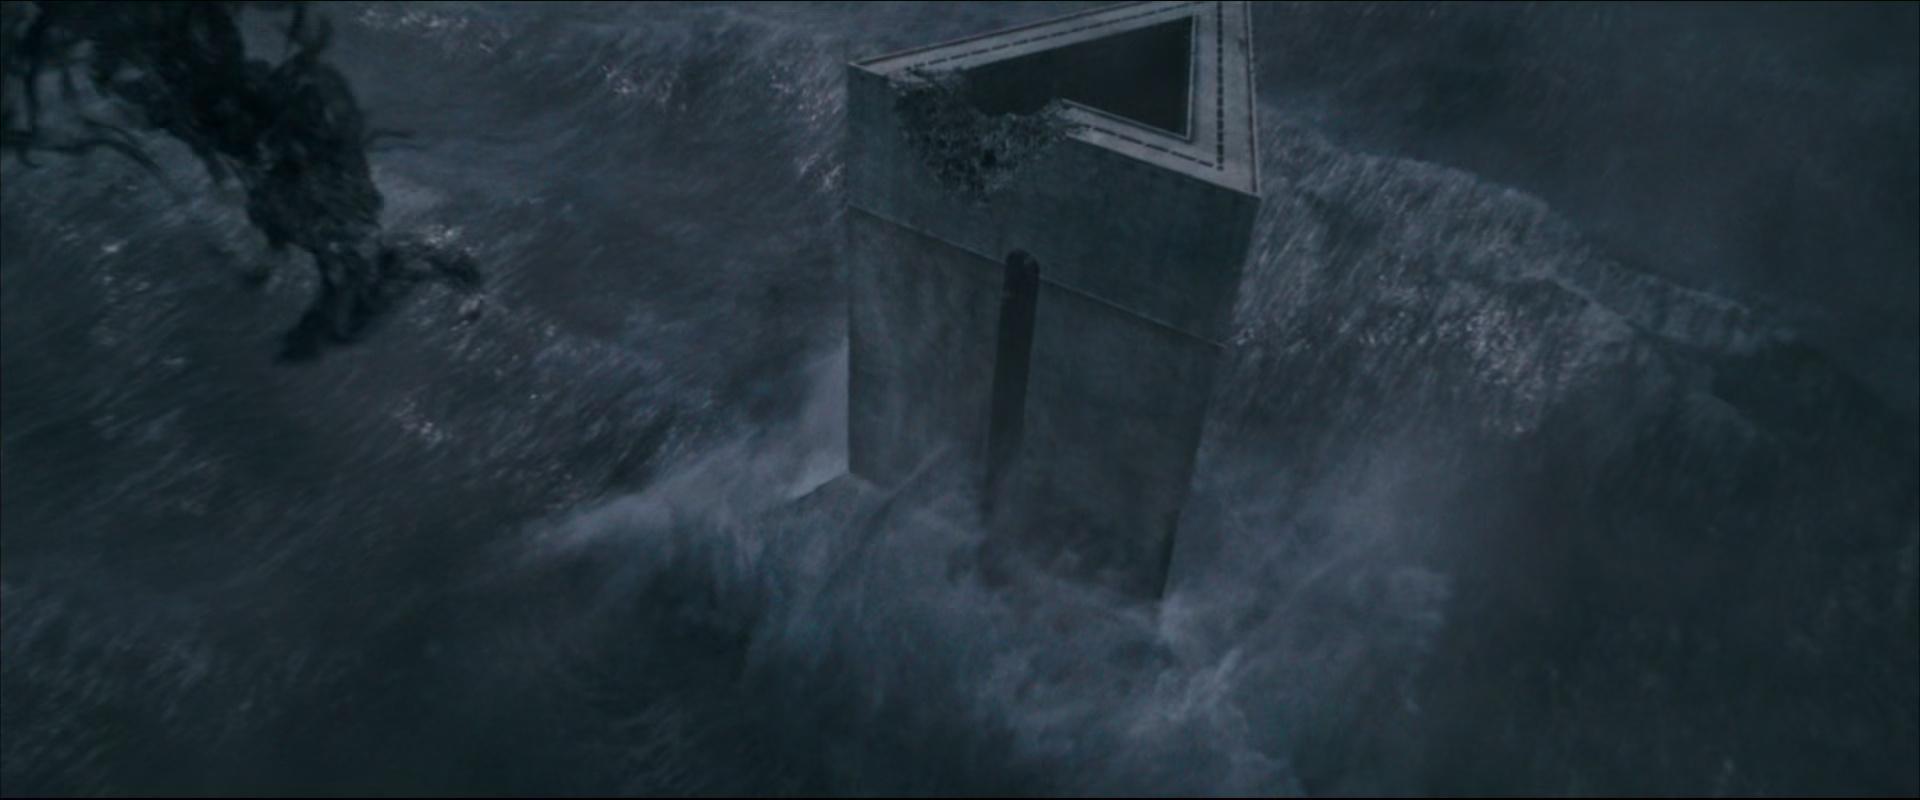 Tiedosto:Azkaban.jpg